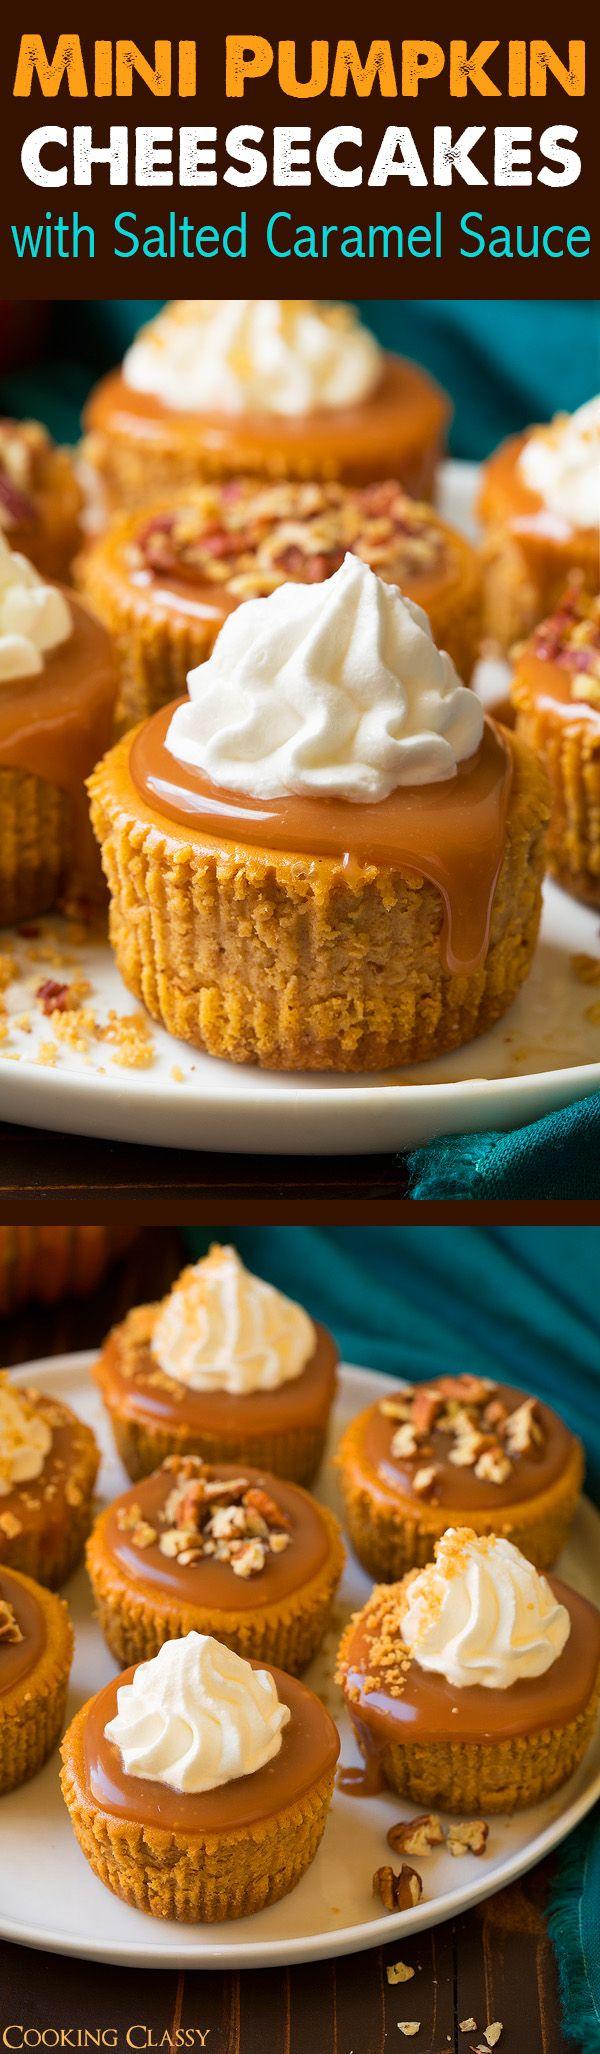 Mini Pumpkin Cheesecakes - An all time favorite fall recipe!